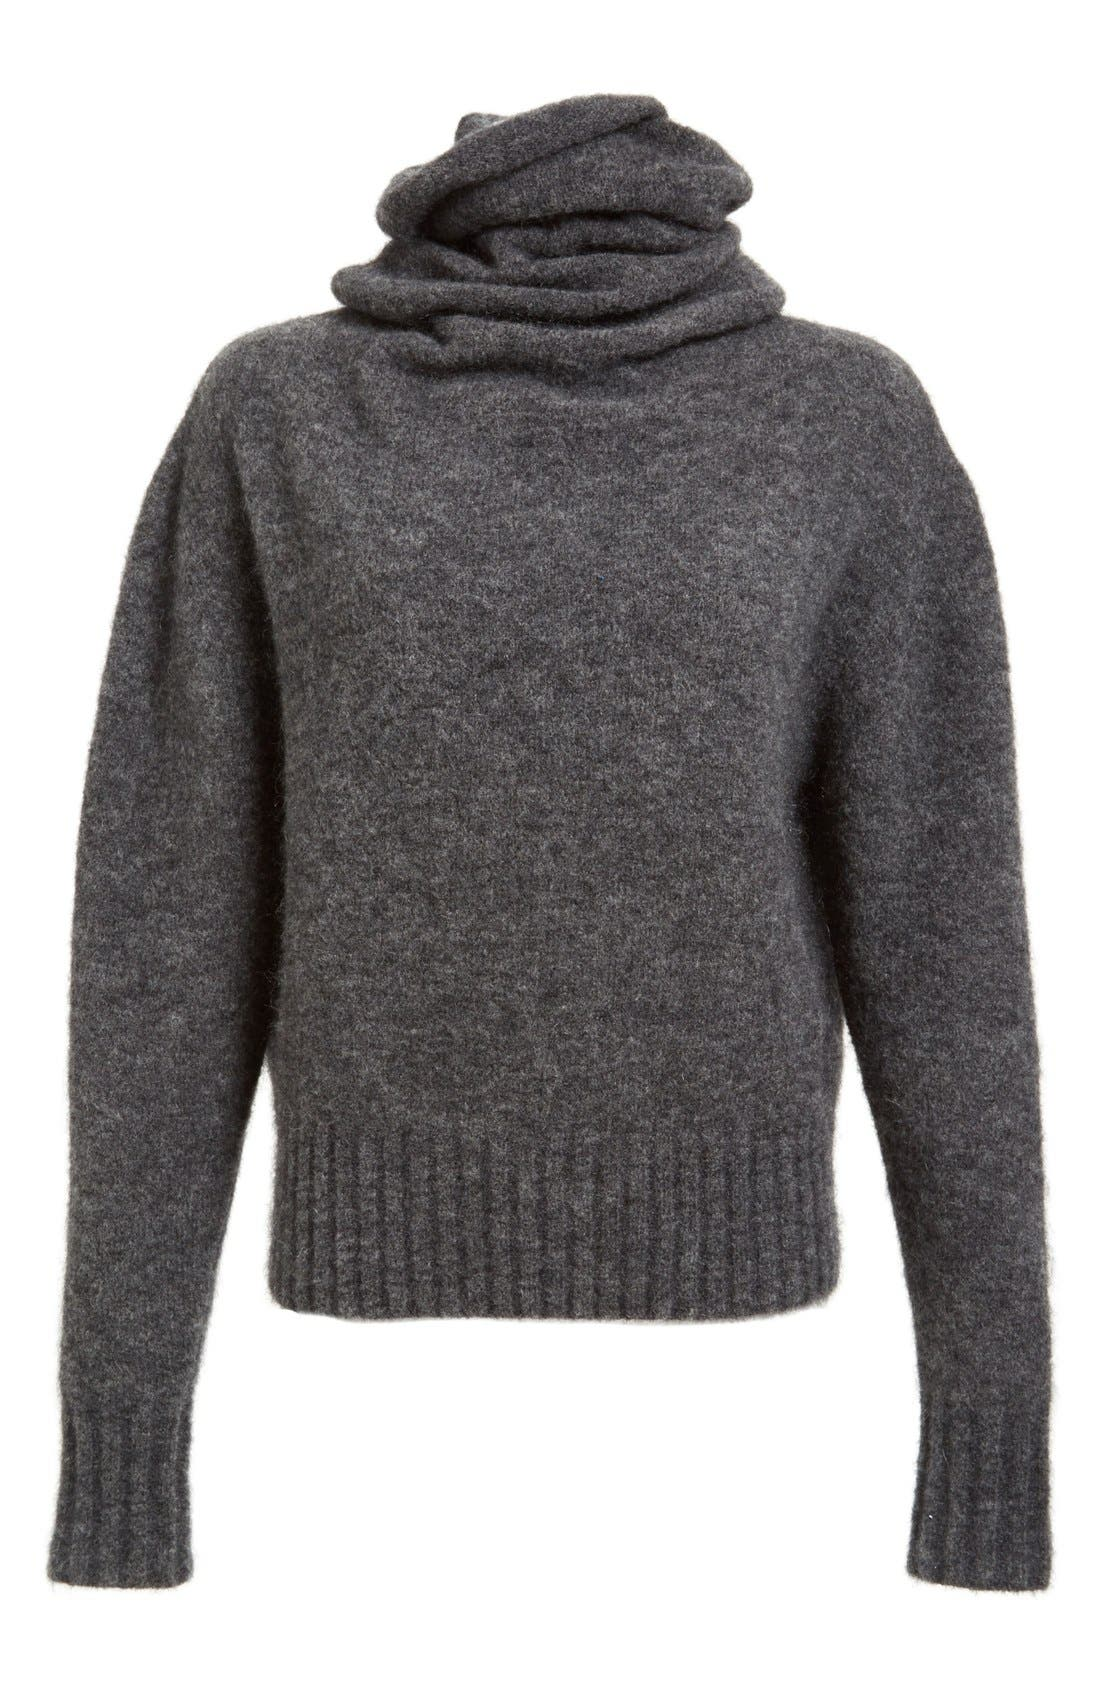 'Voletta Mohair' Turtleneck Sweater,                             Alternate thumbnail 2, color,                             021